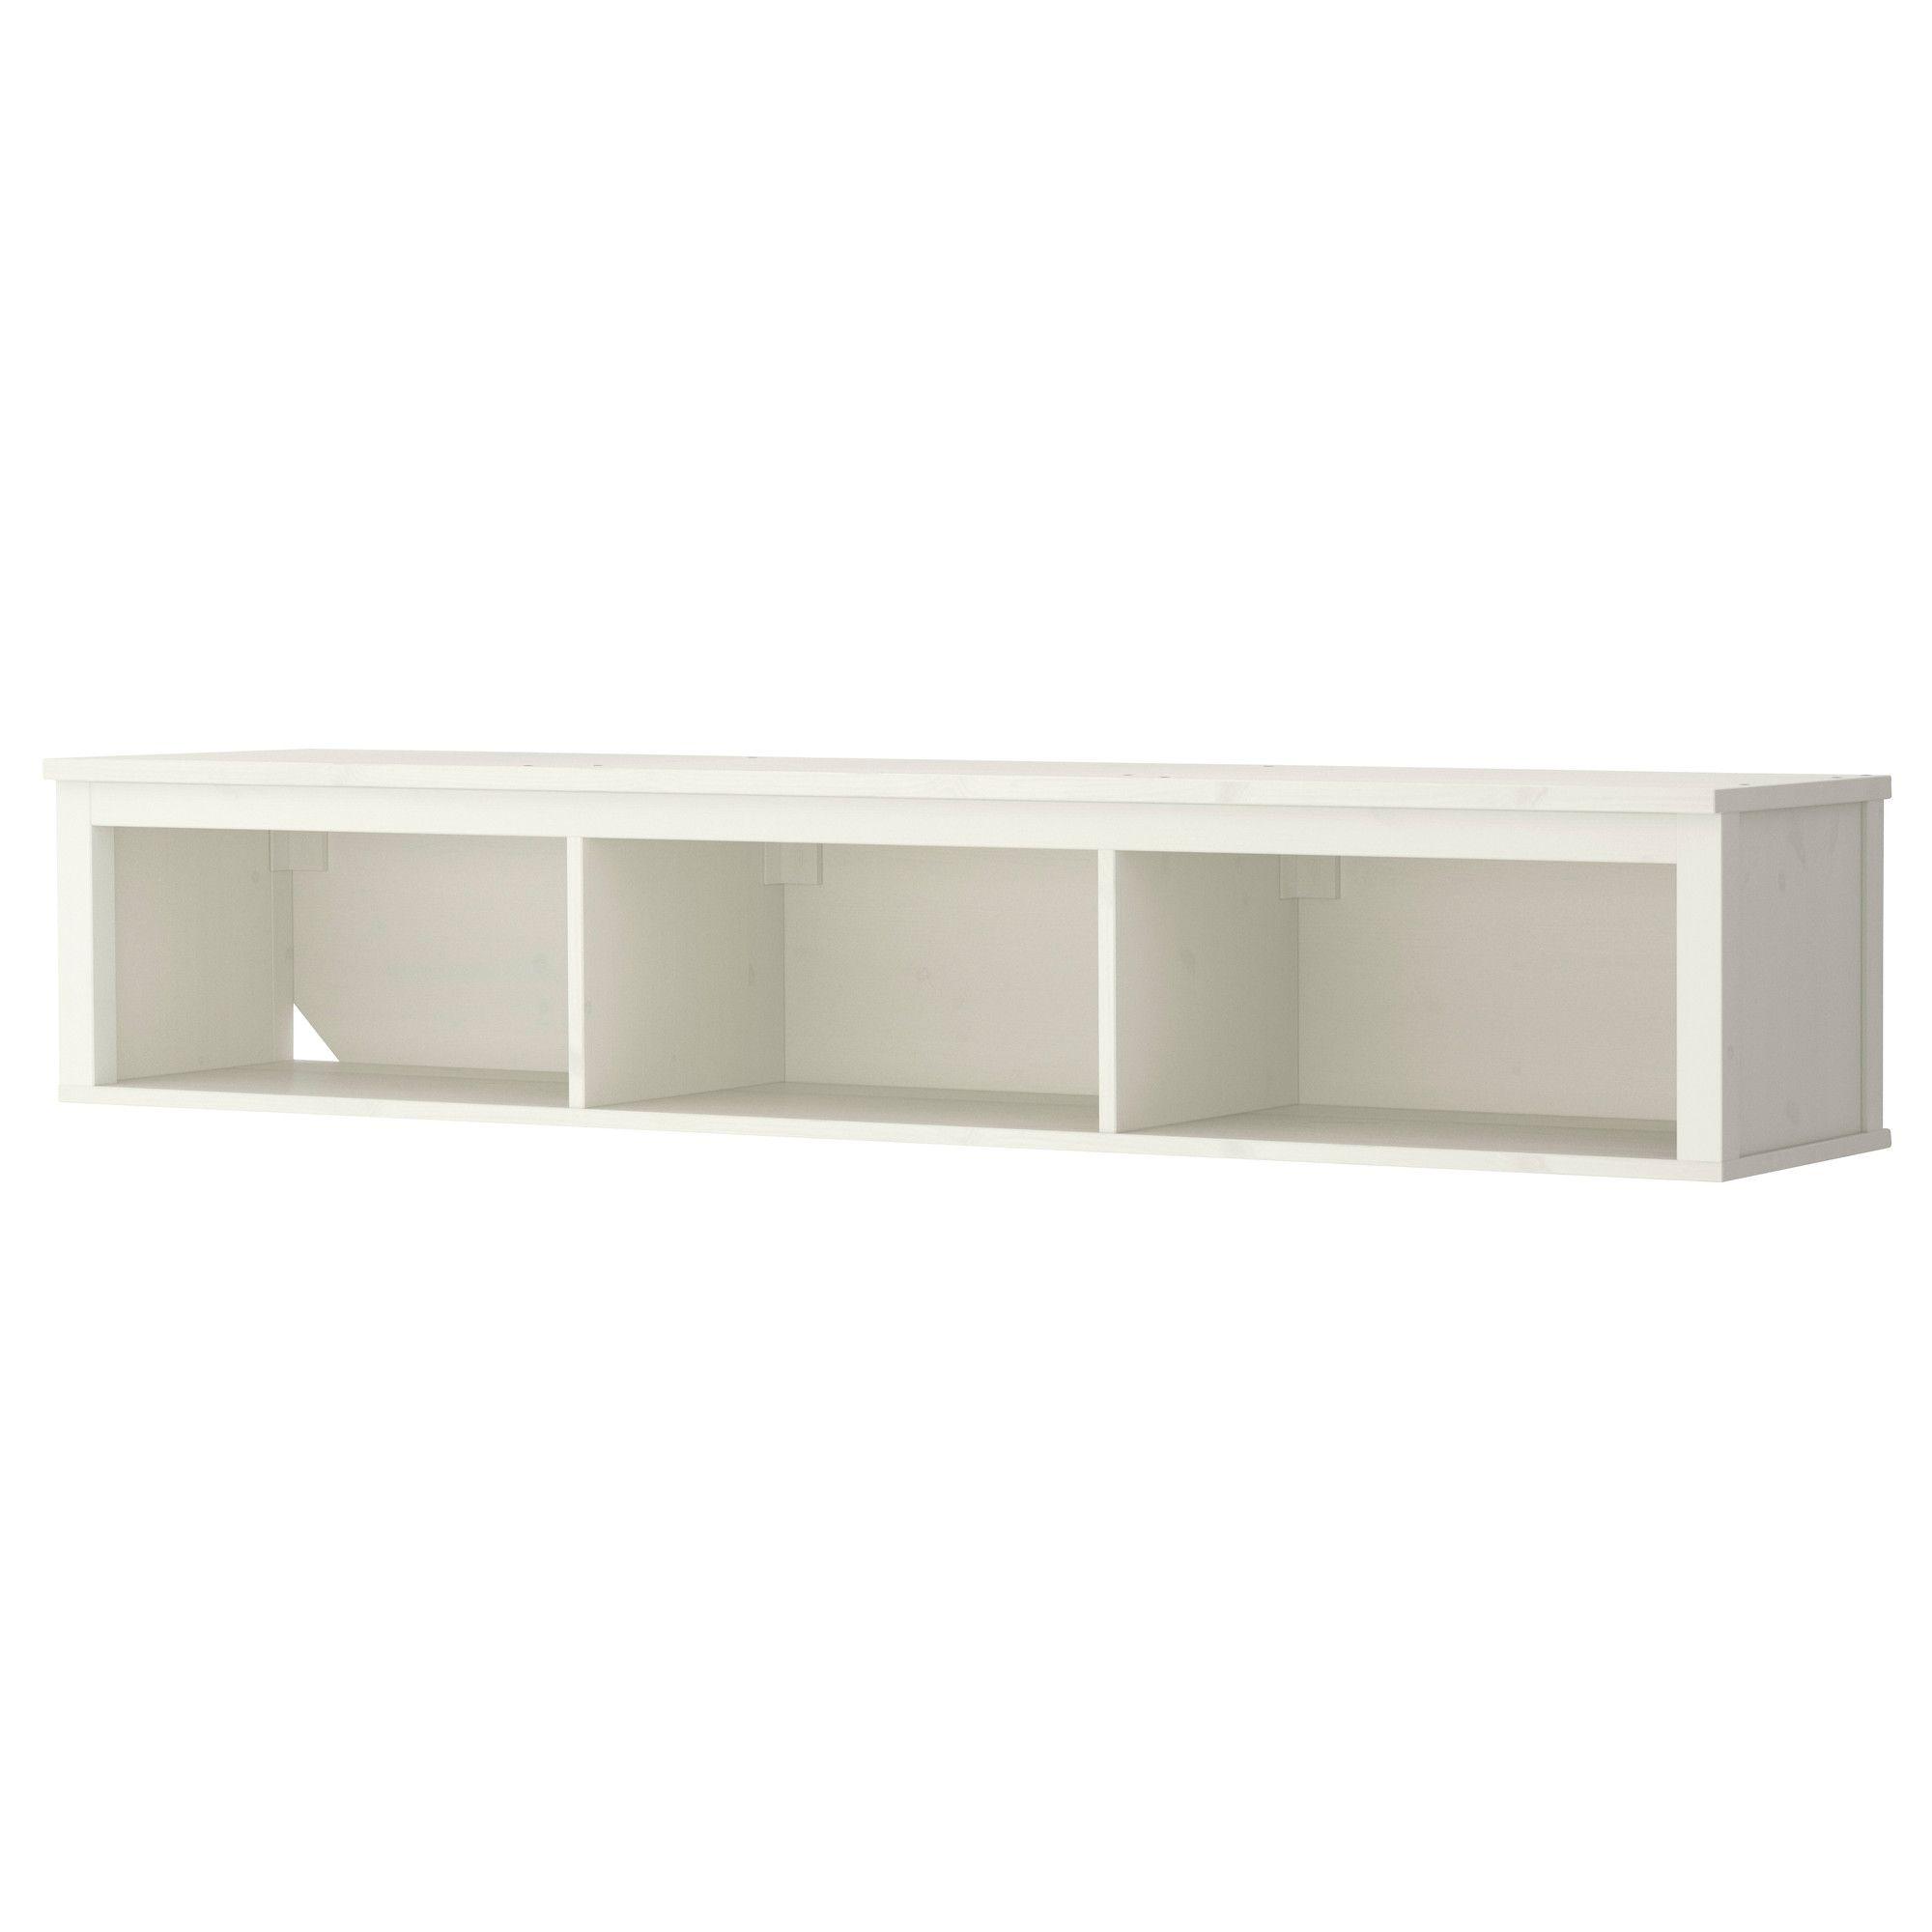 Hemnes Polka Scienna Biala Bejca Ikea Furniture